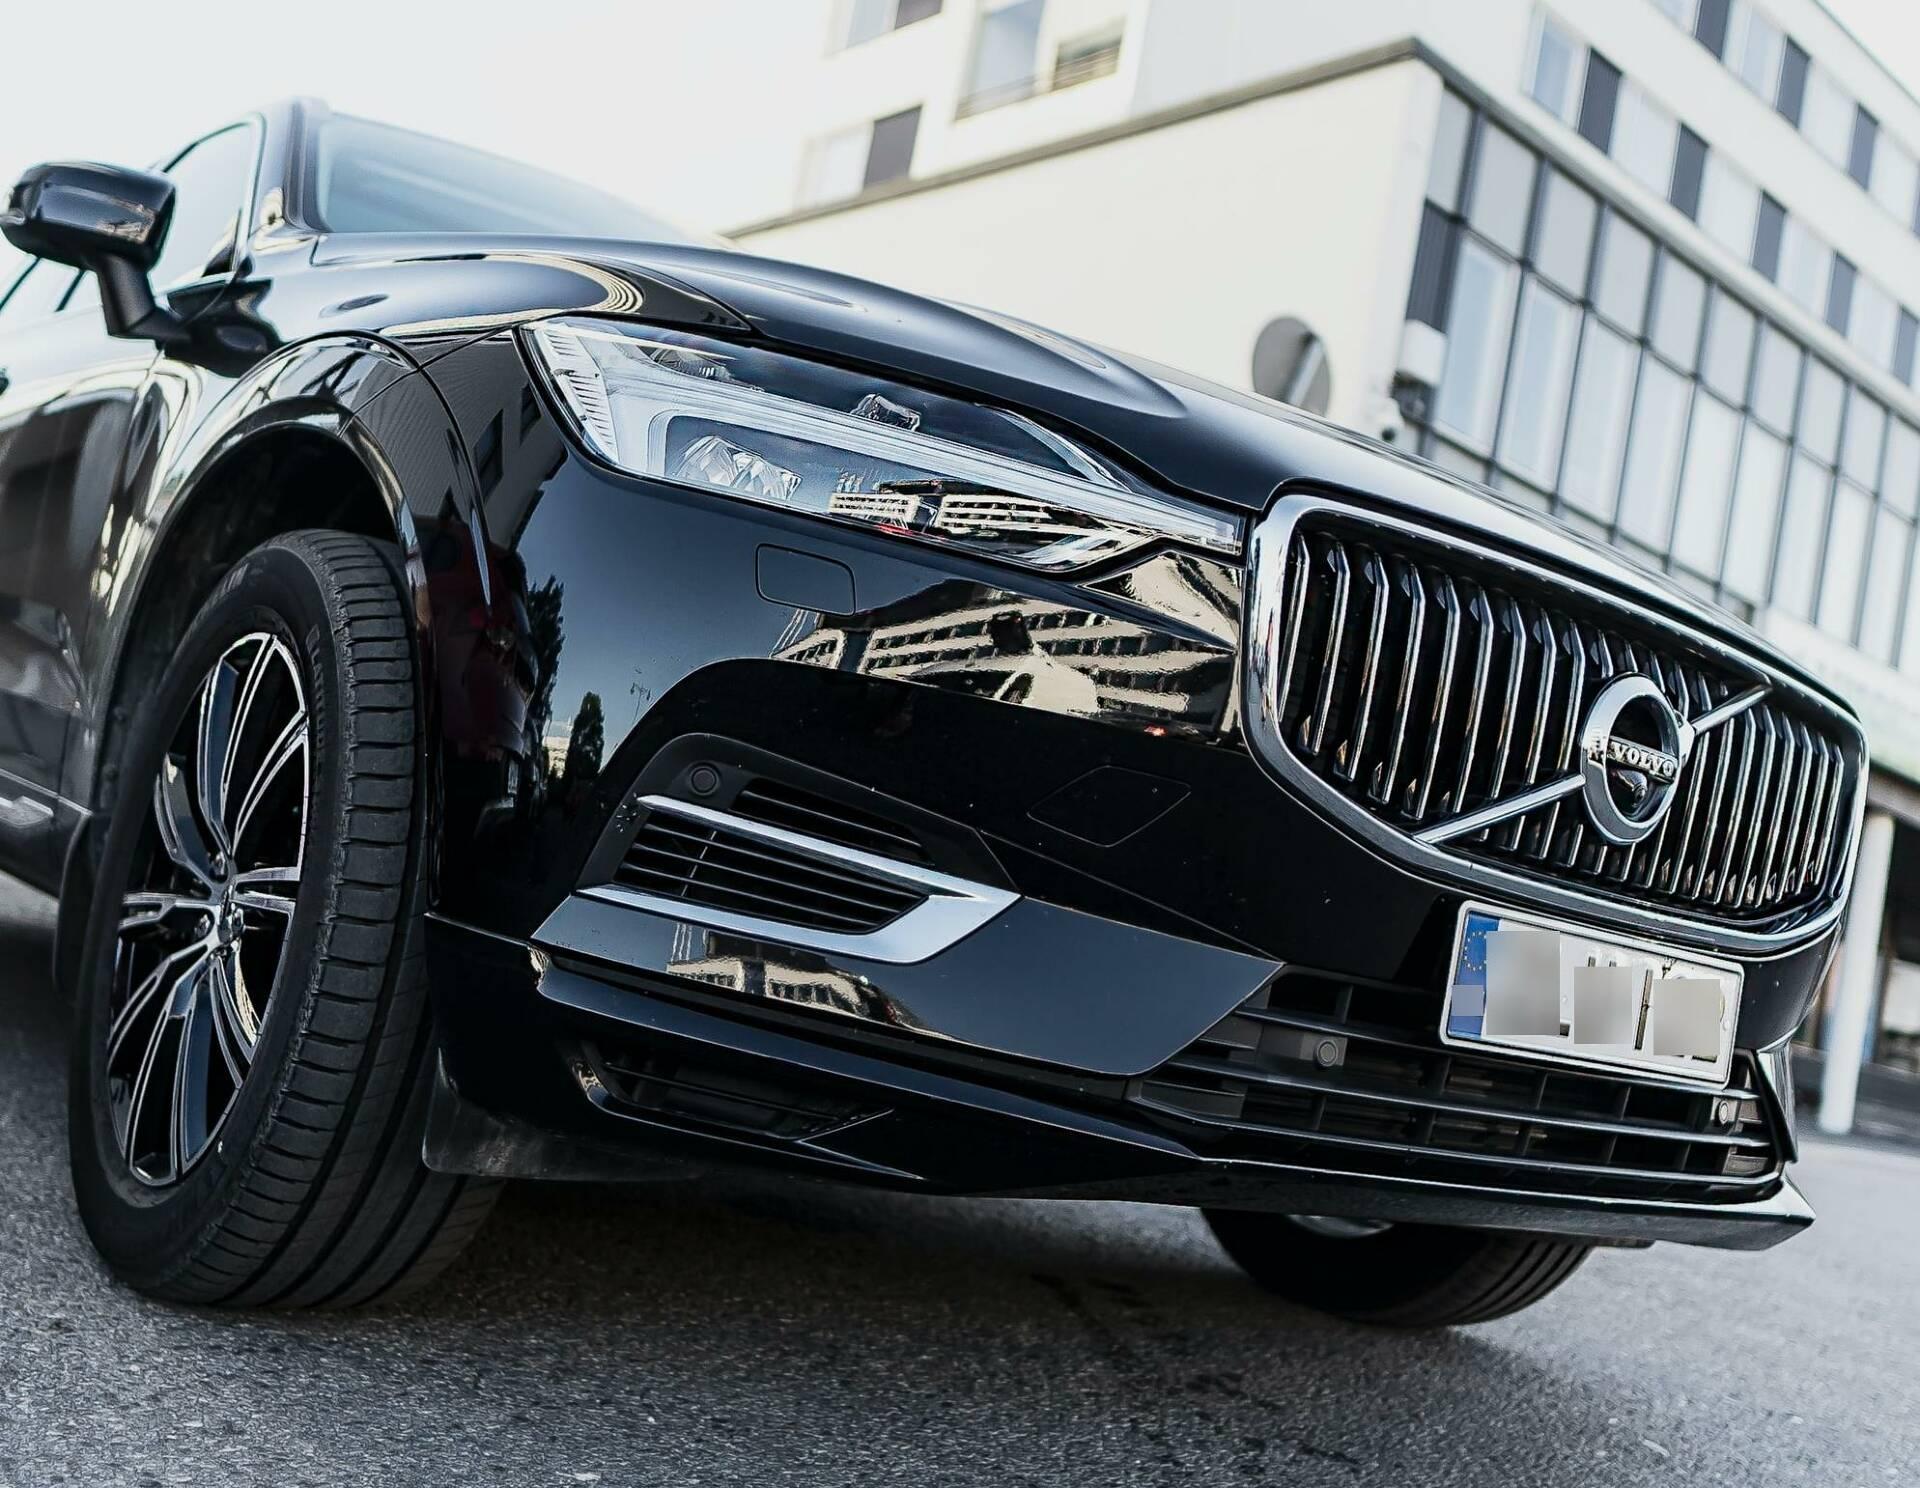 Porówneo: Leasing konsumencki samochodu – na czym polega?